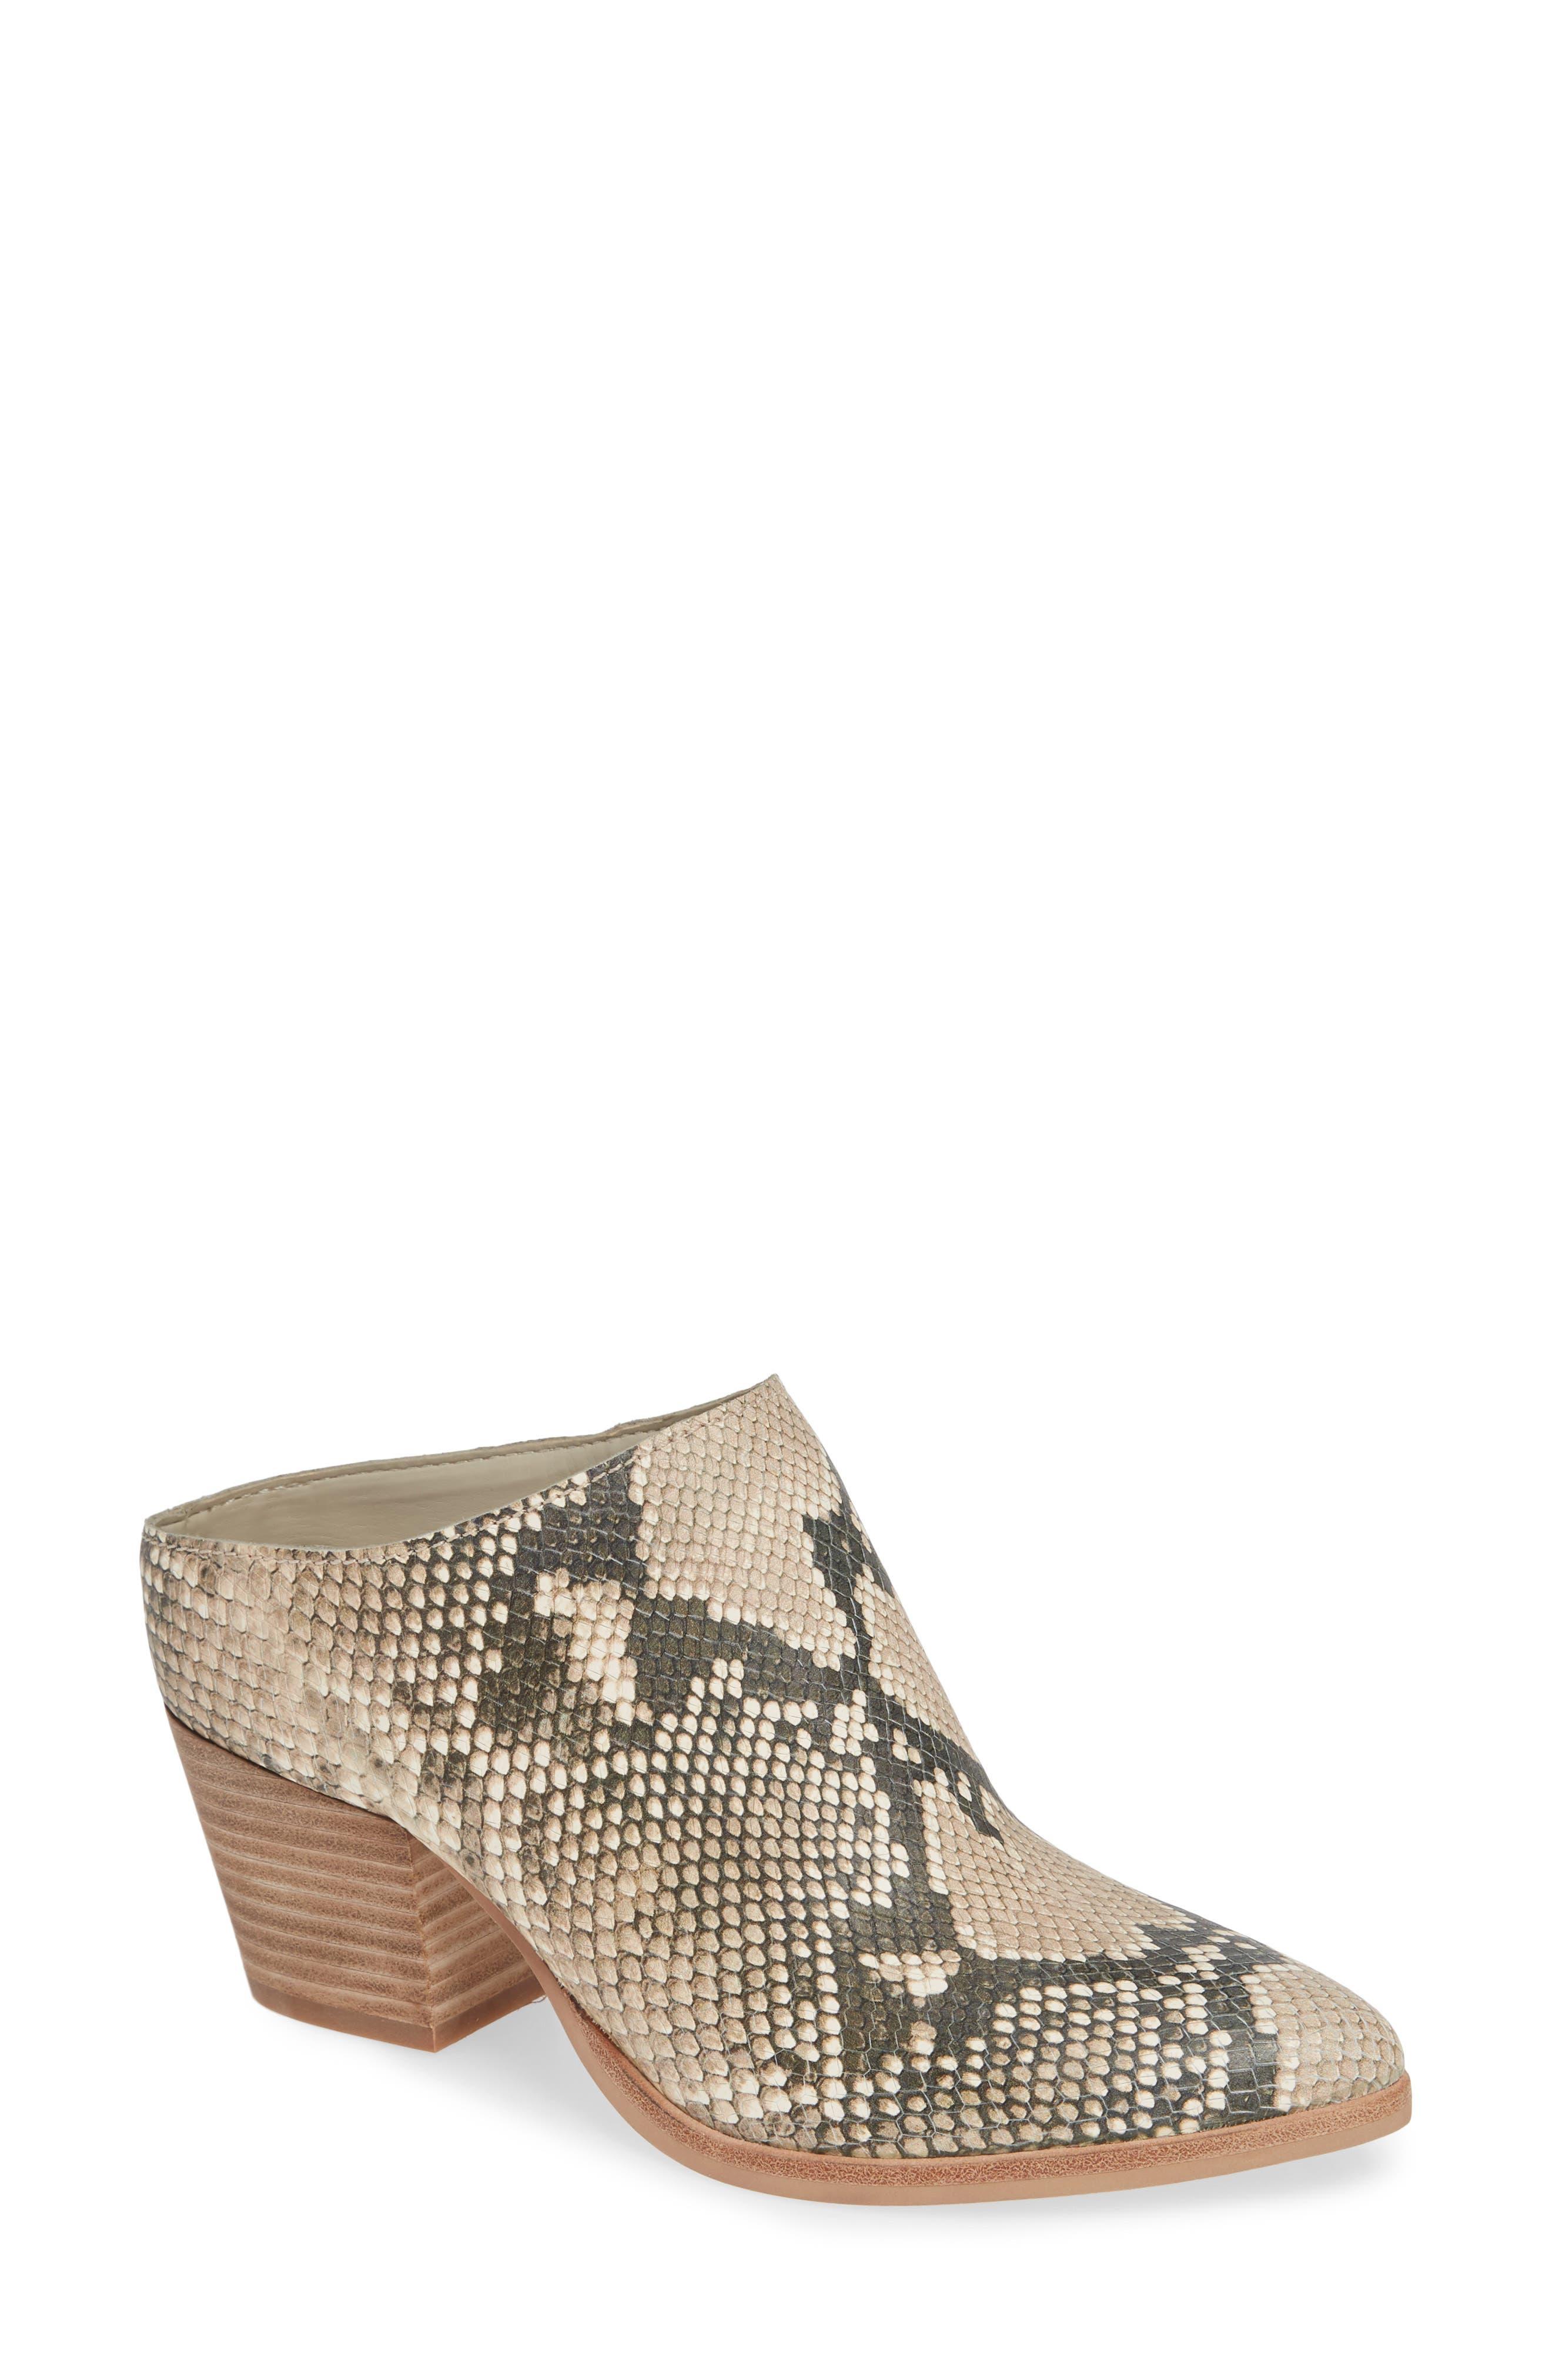 DOLCE VITA Women'S Roya Almond Toe Snakeskin-Embossed Leather Mid-Heel Mules in Snake Print